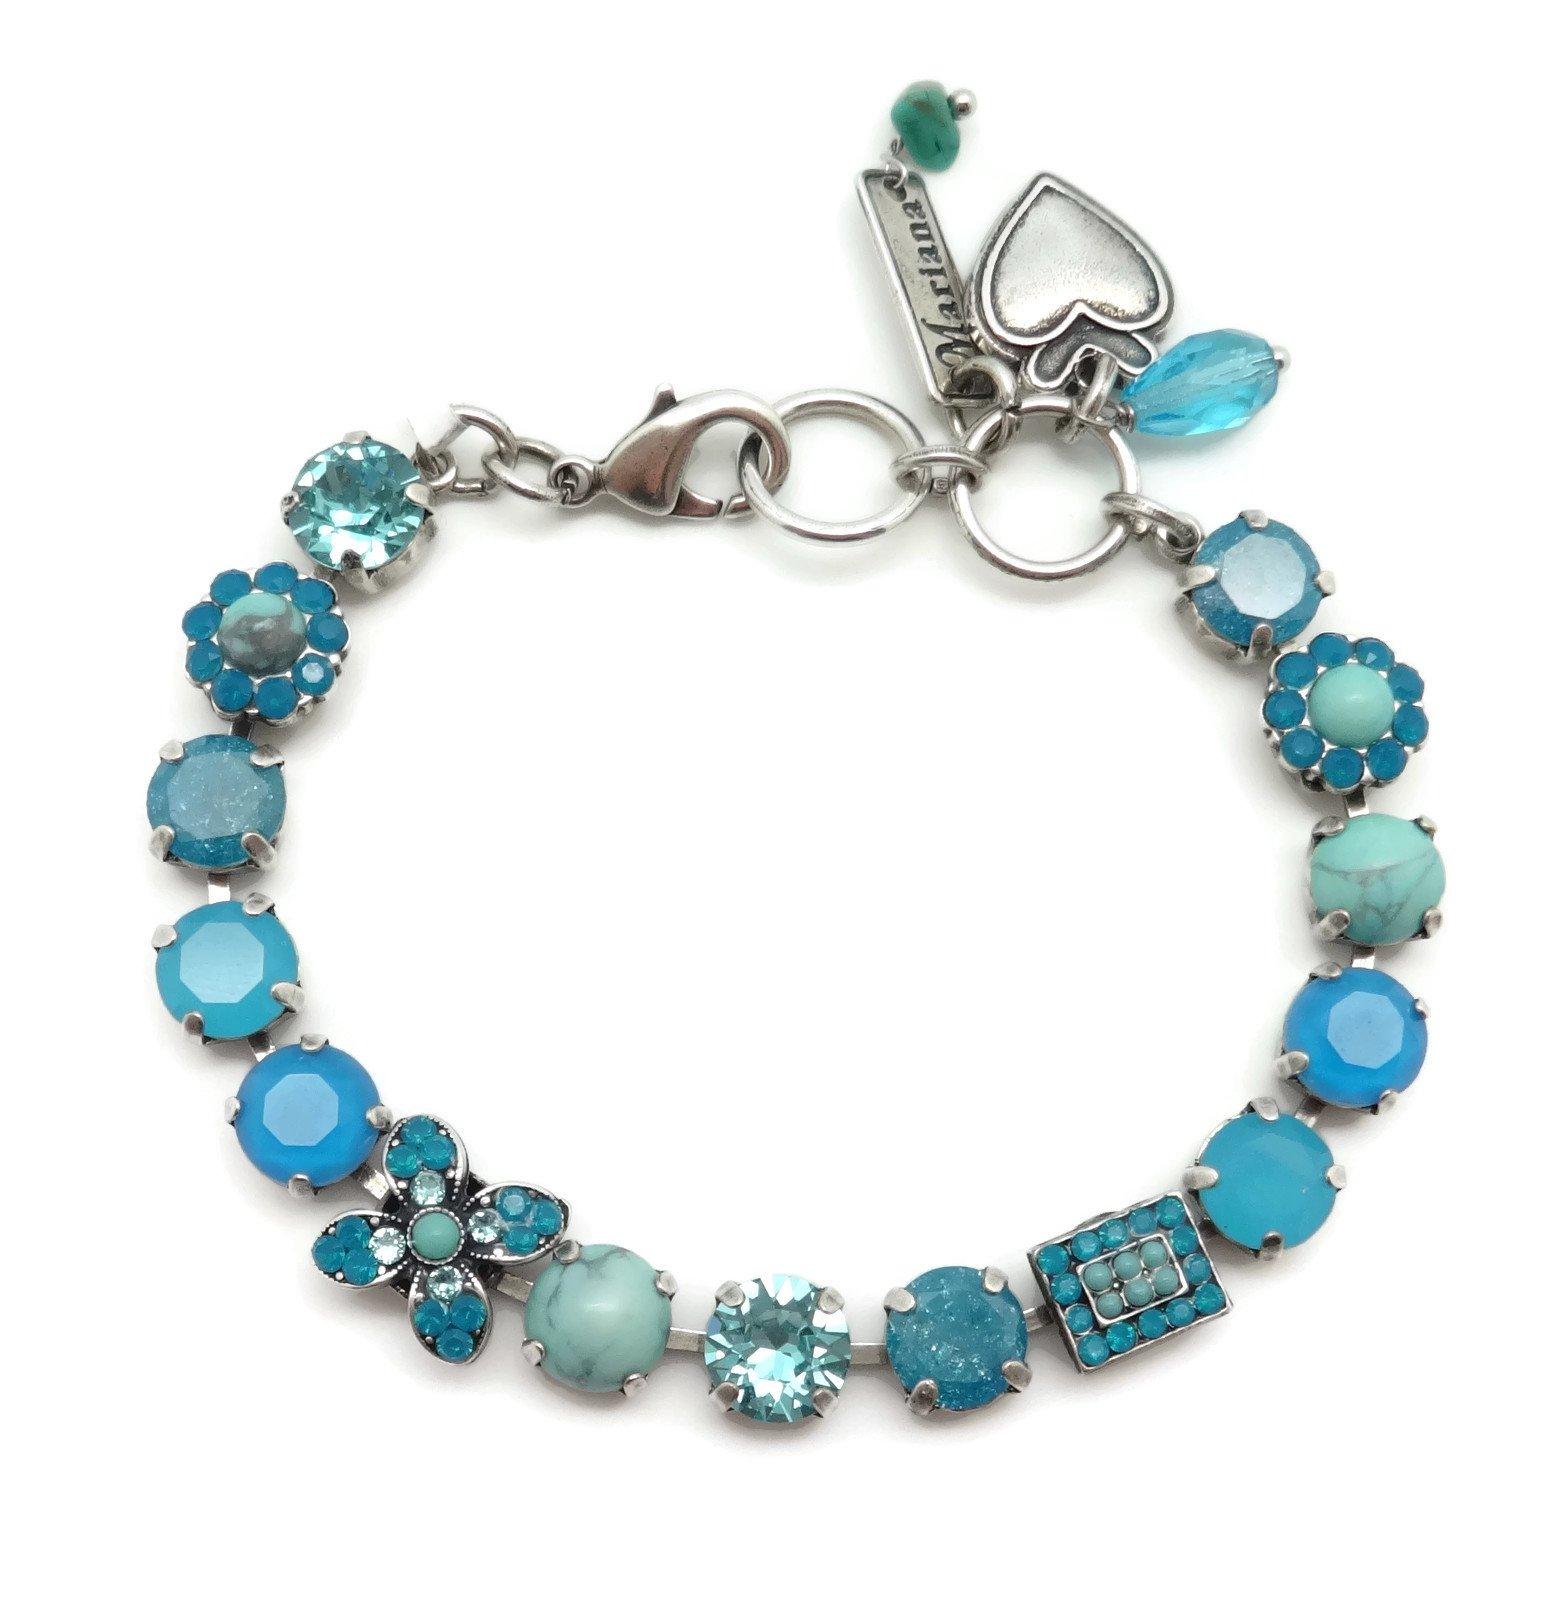 Marinaa Silver Plated Swarovski Crystal Bracelet Aqua Mix Floral Mosaic M1082 Zambezi